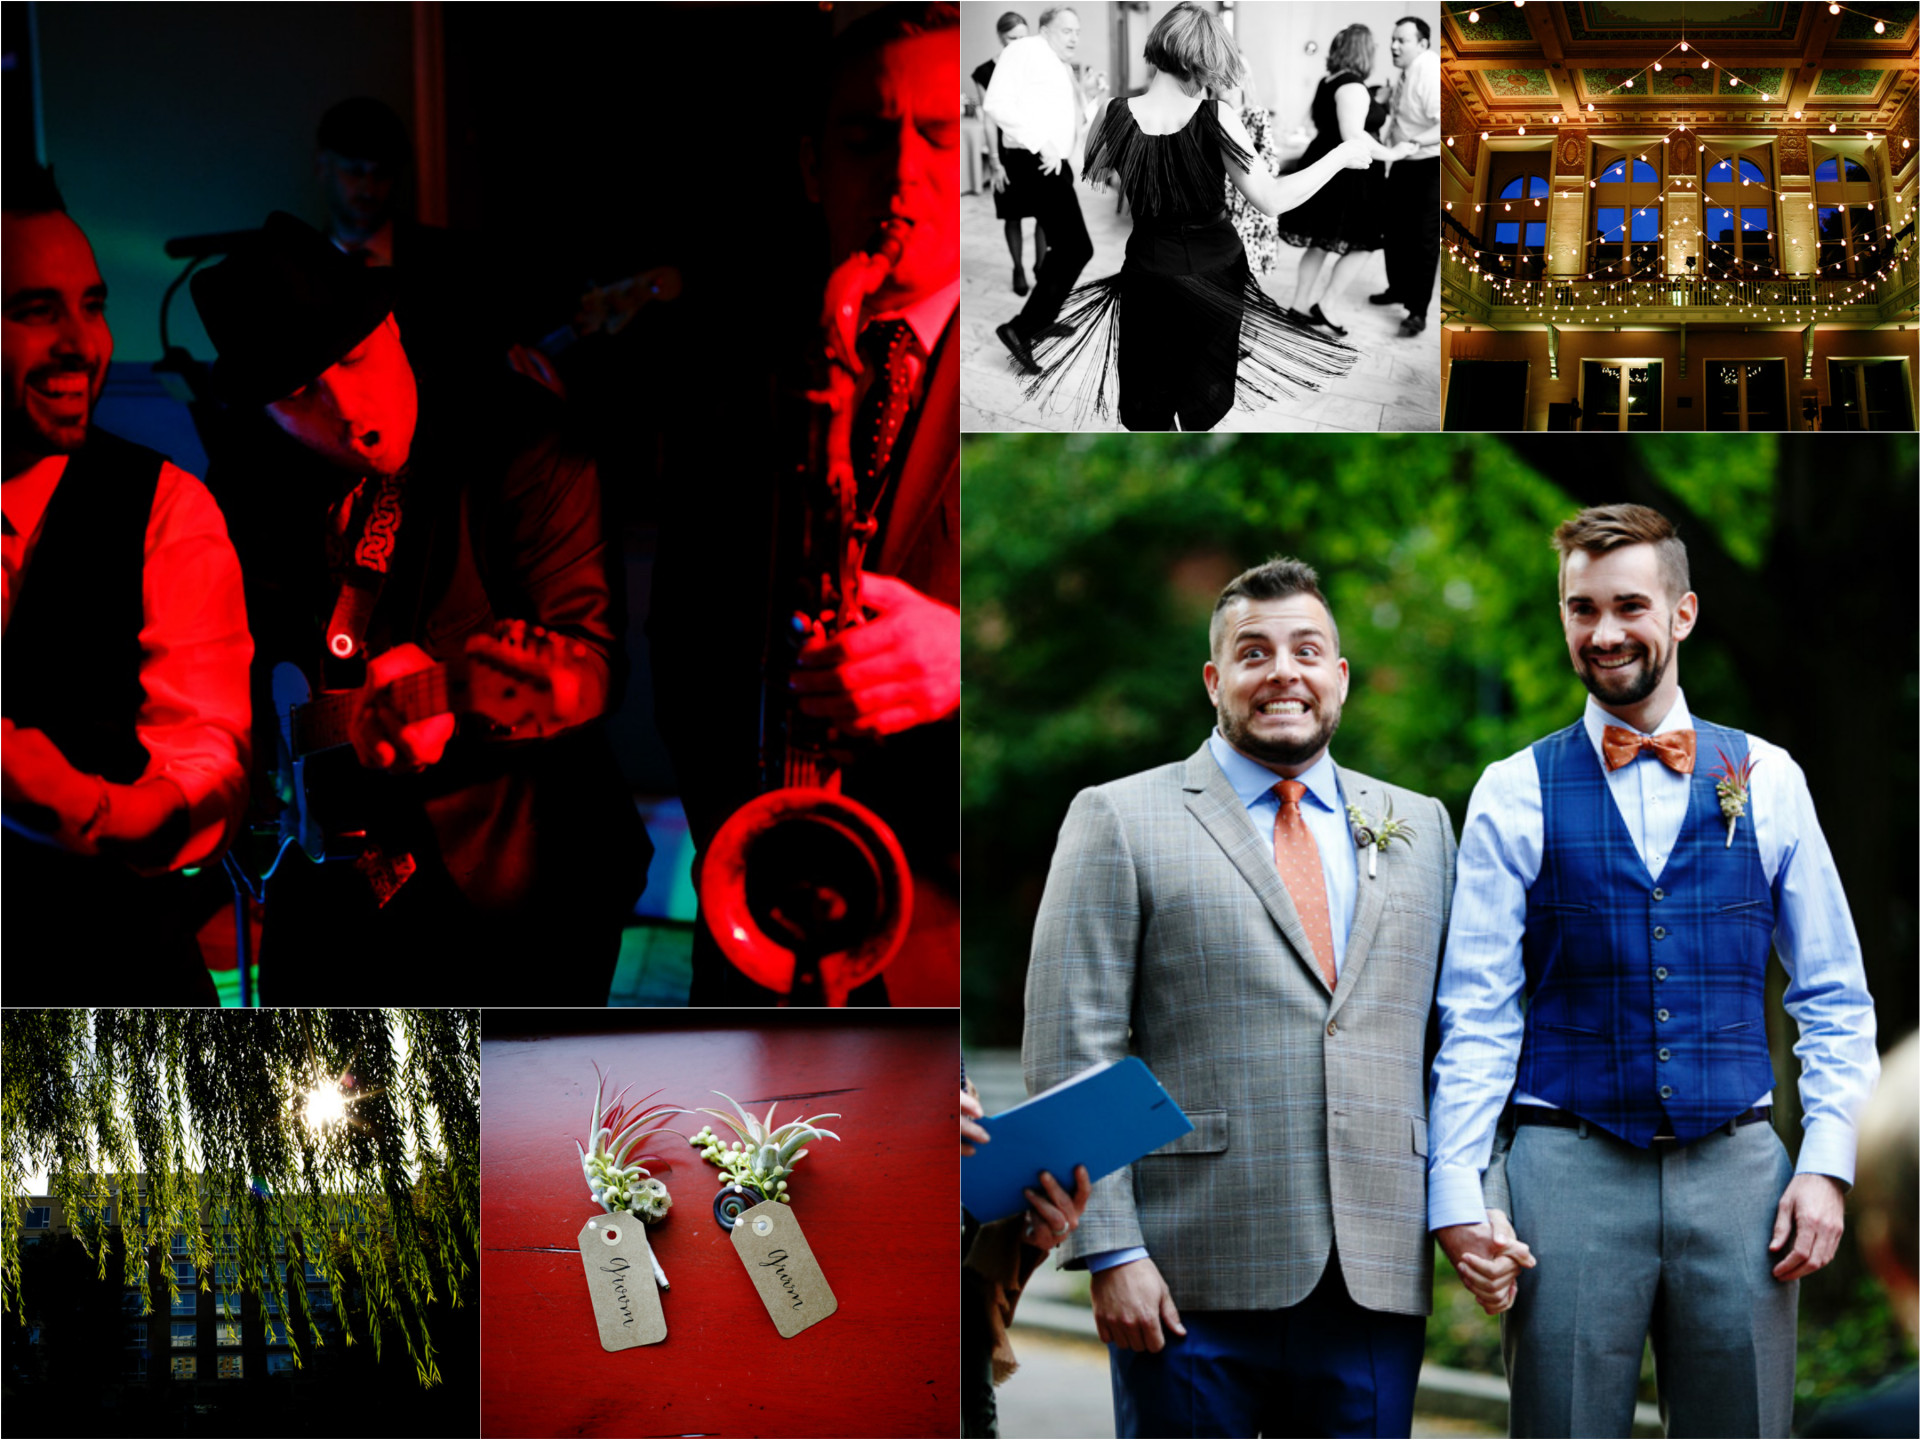 cambridge-multicultural-arts-center-wedding-17_Fotor_Collage